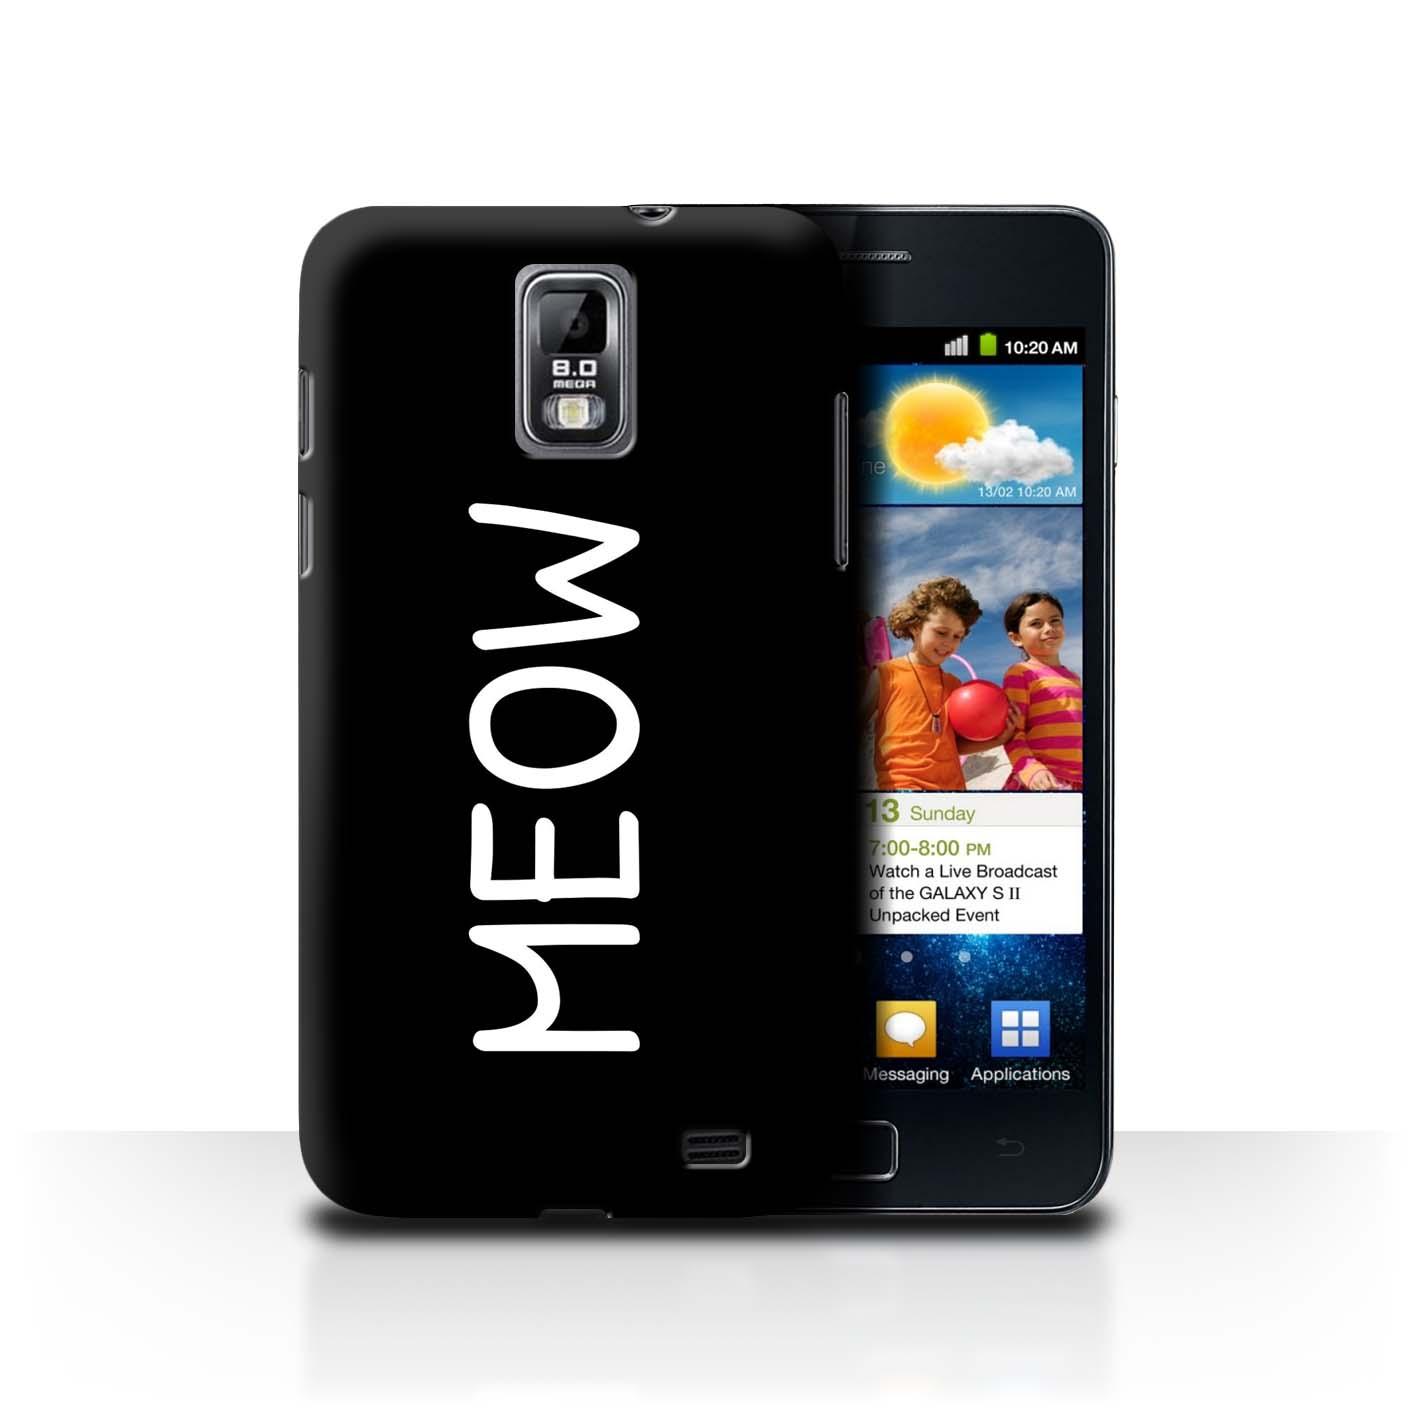 Coque-Etui-Housse-pour-Samsung-Galaxy-S2-Duos-i929-Chat-Mignon-Dessin-Anime